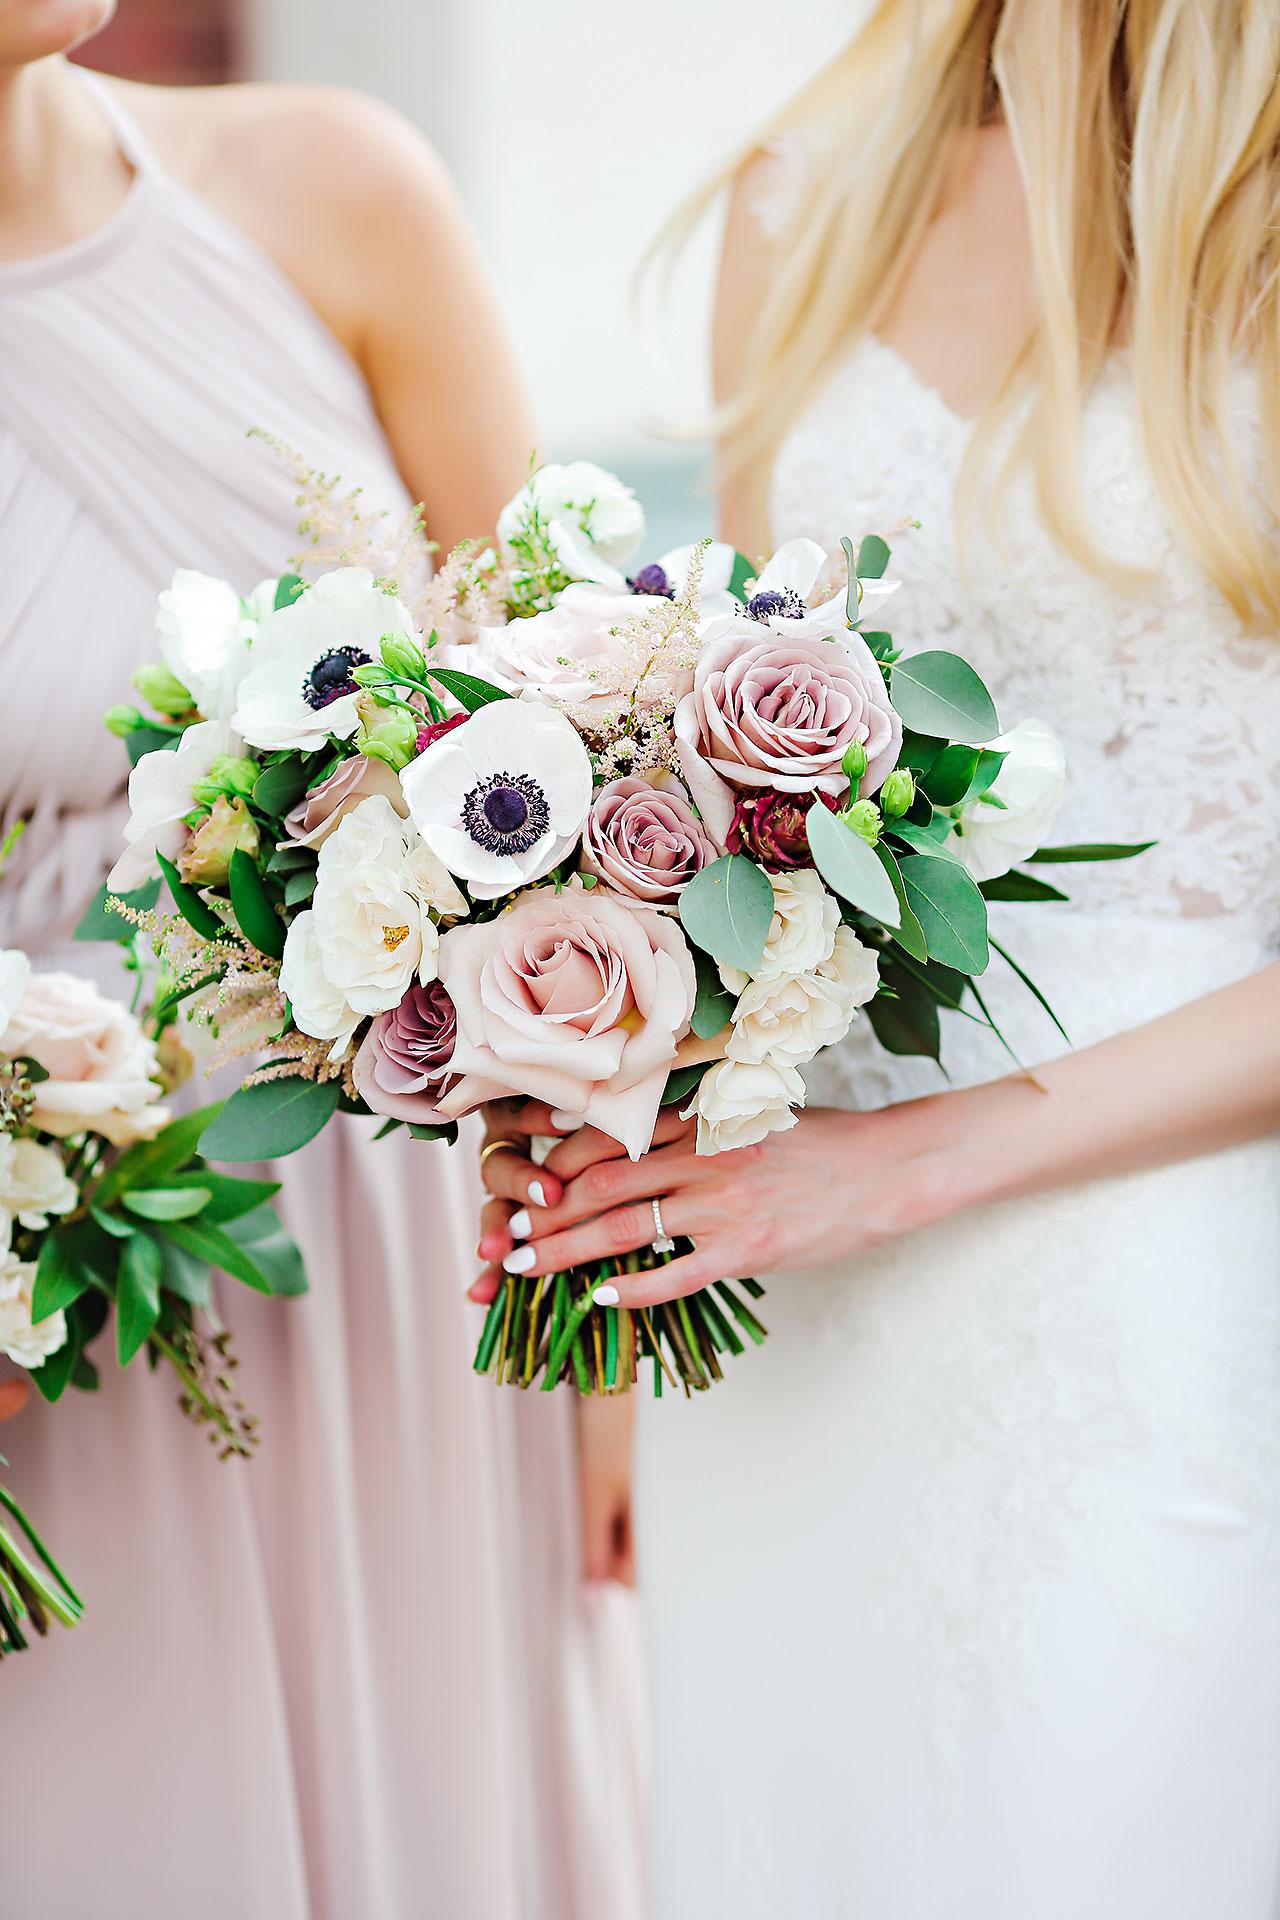 Molly Declan Scottish Rite Indianapolis Wedding 108